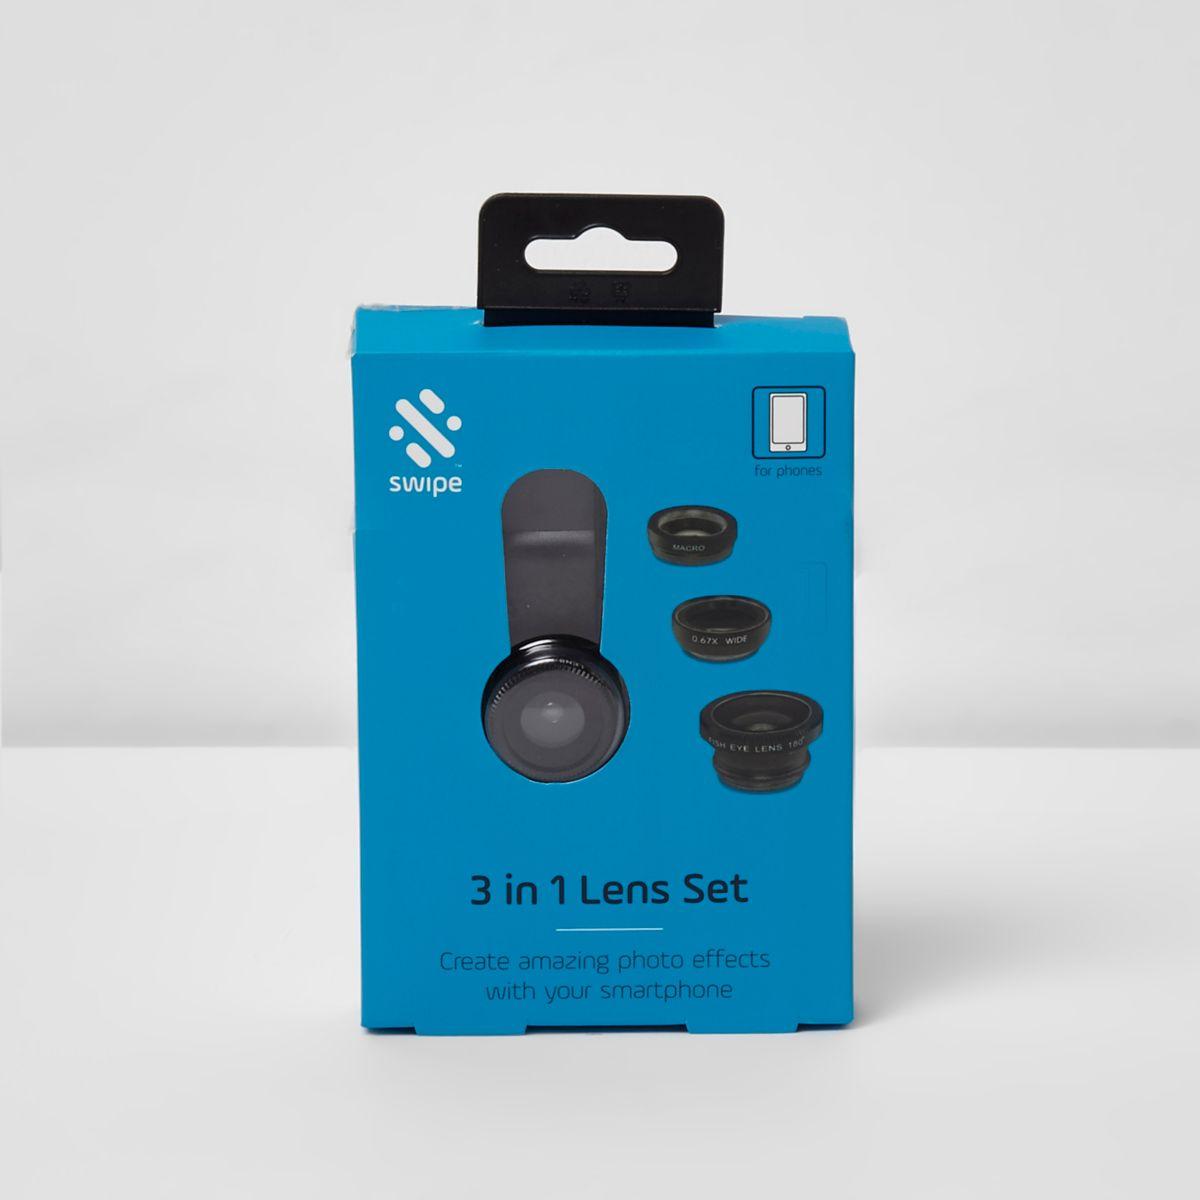 Swipe 3 in 1 lens smartphone set